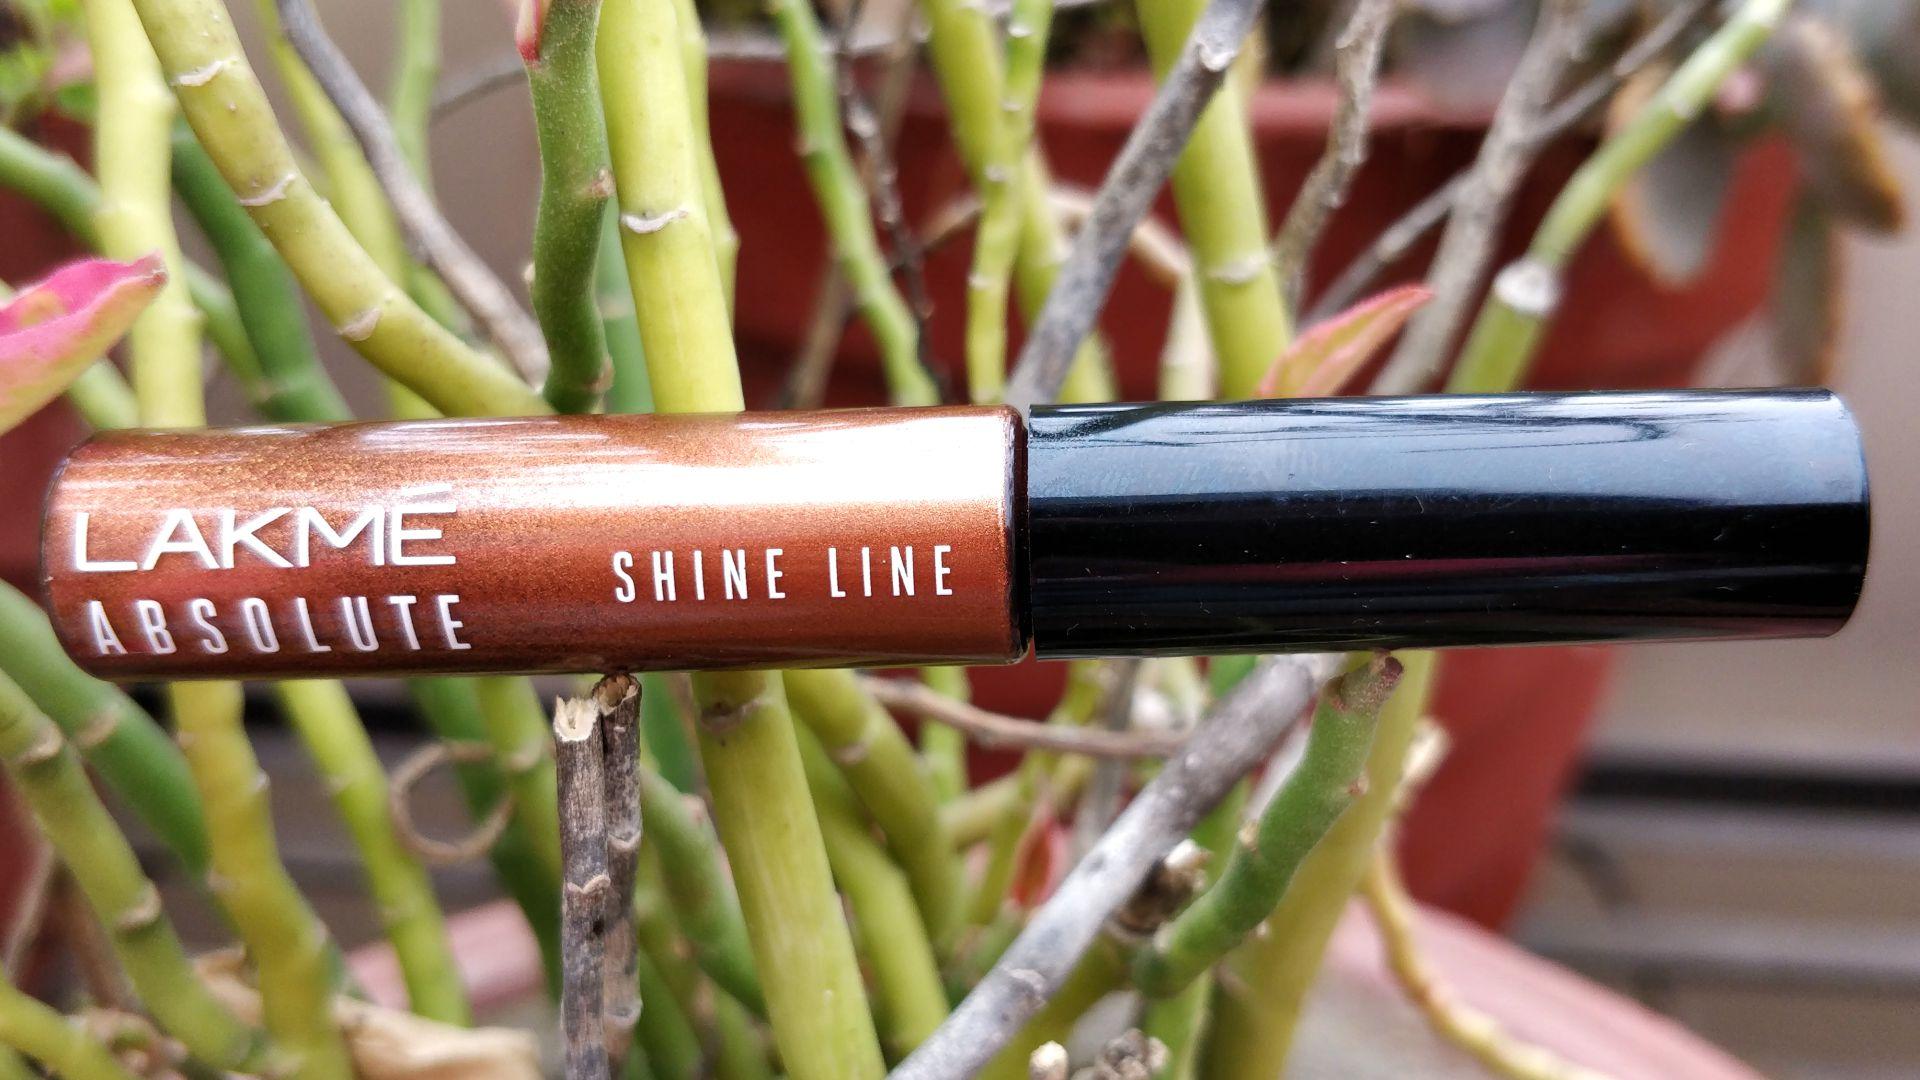 Lakme Absolute Shine Line